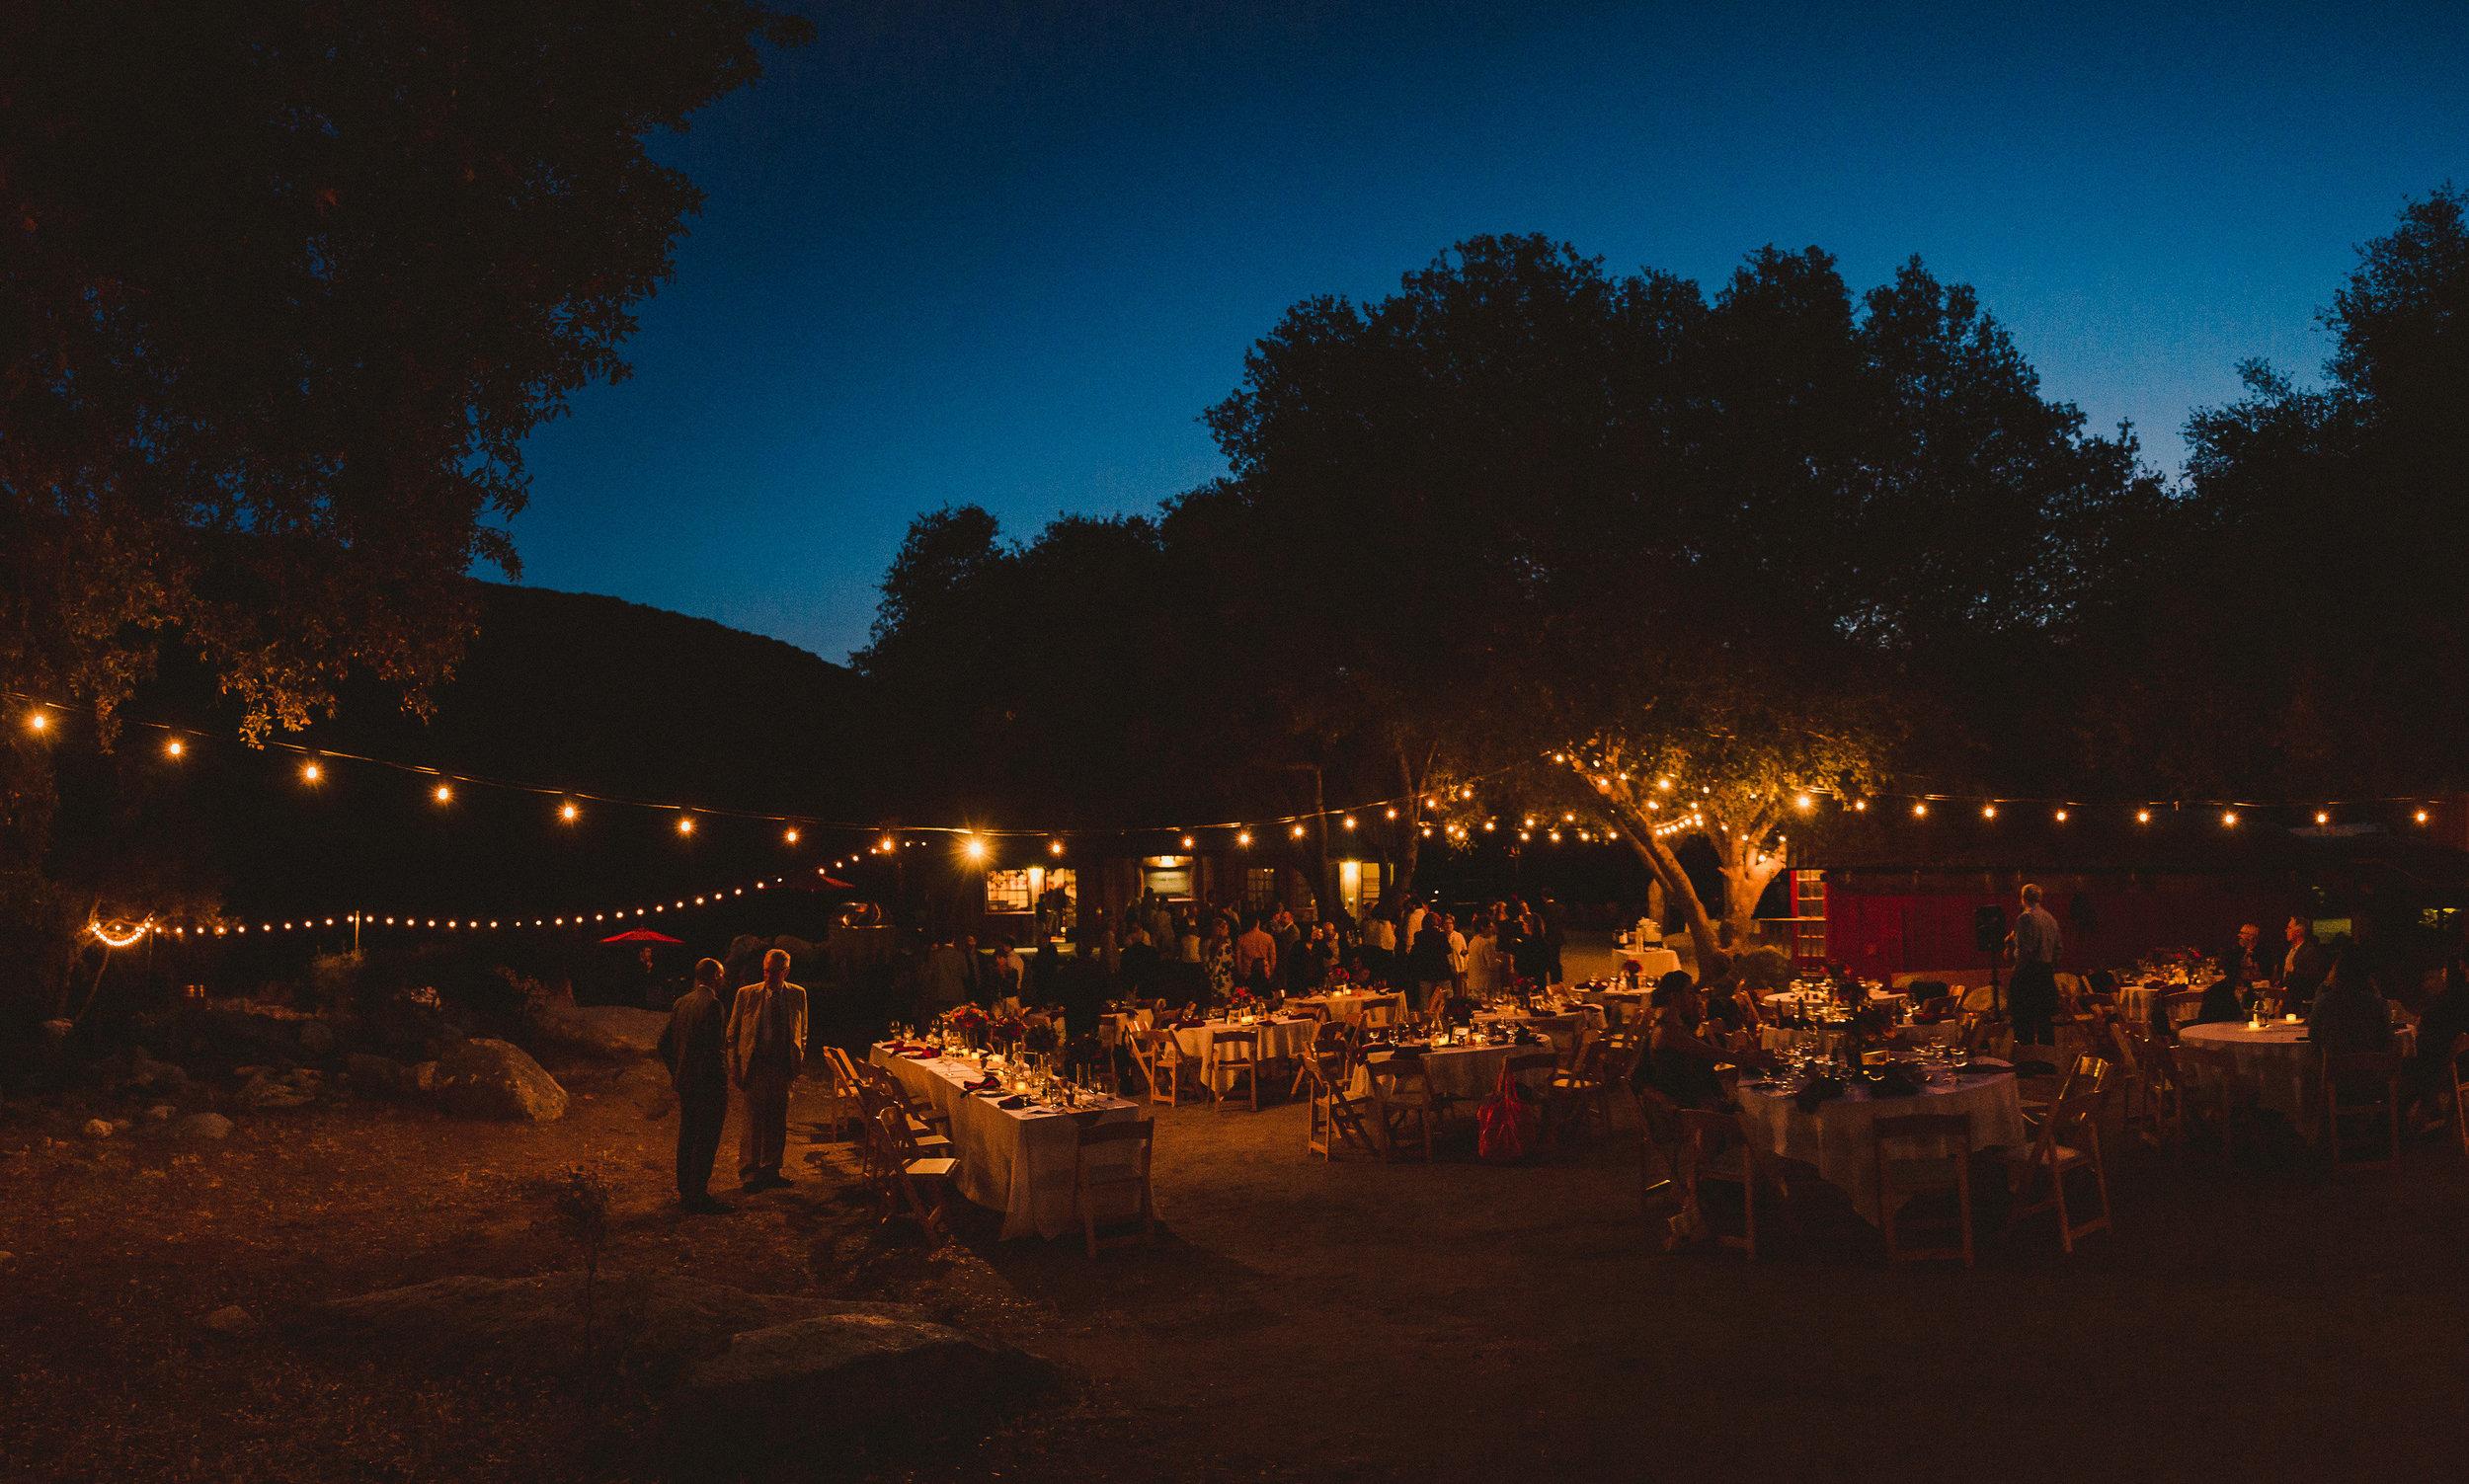 Redwood-Ranch-Three-Rivers-Wedding-Venue-13.jpg